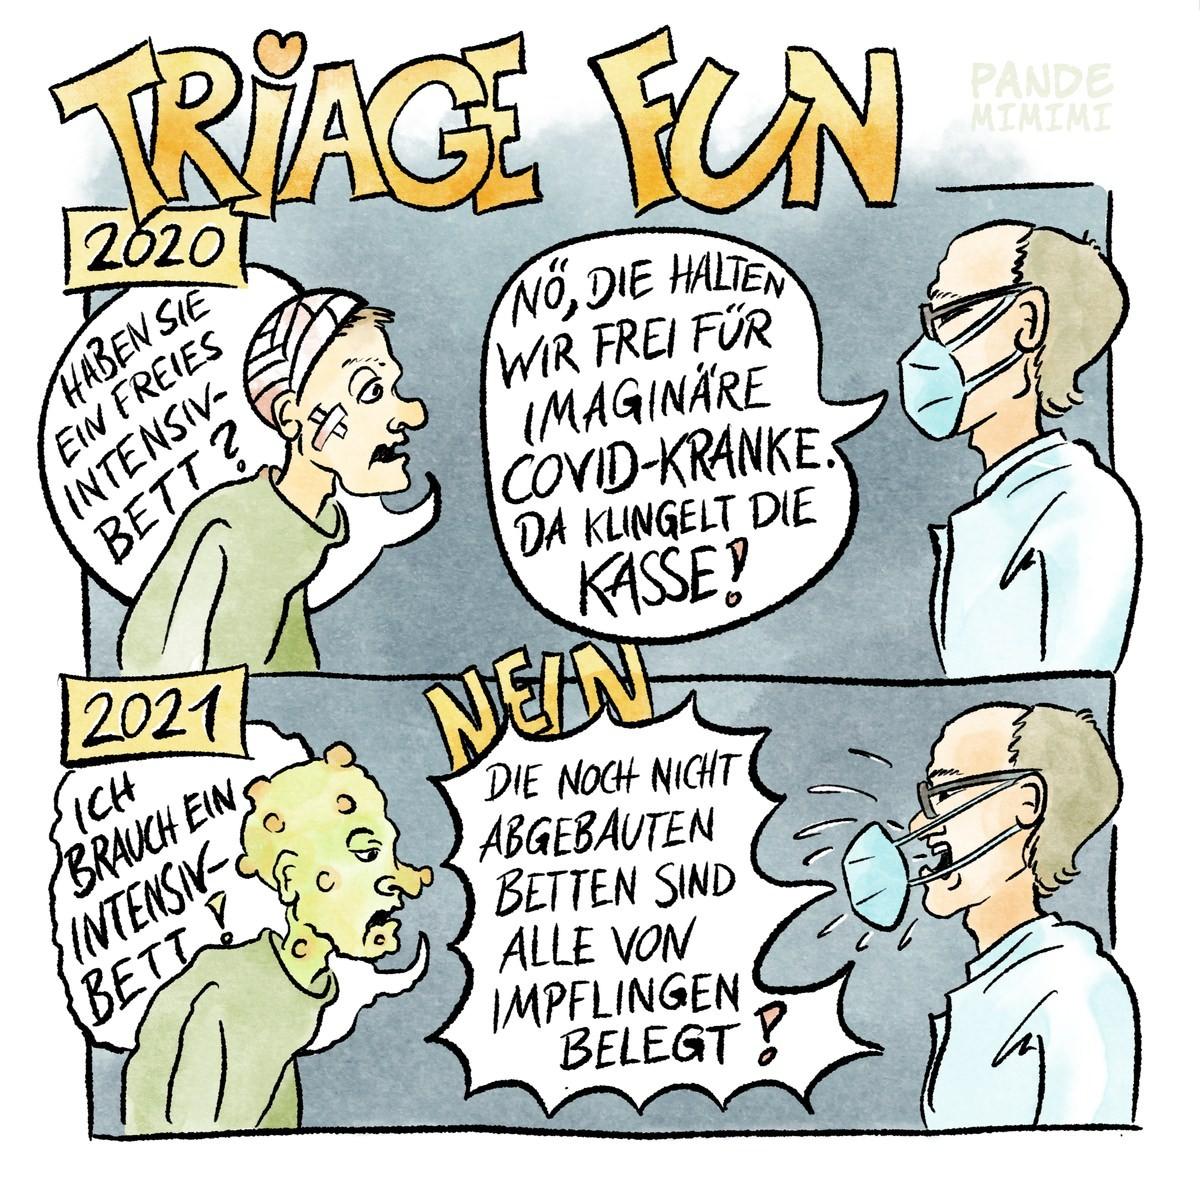 TriageFun